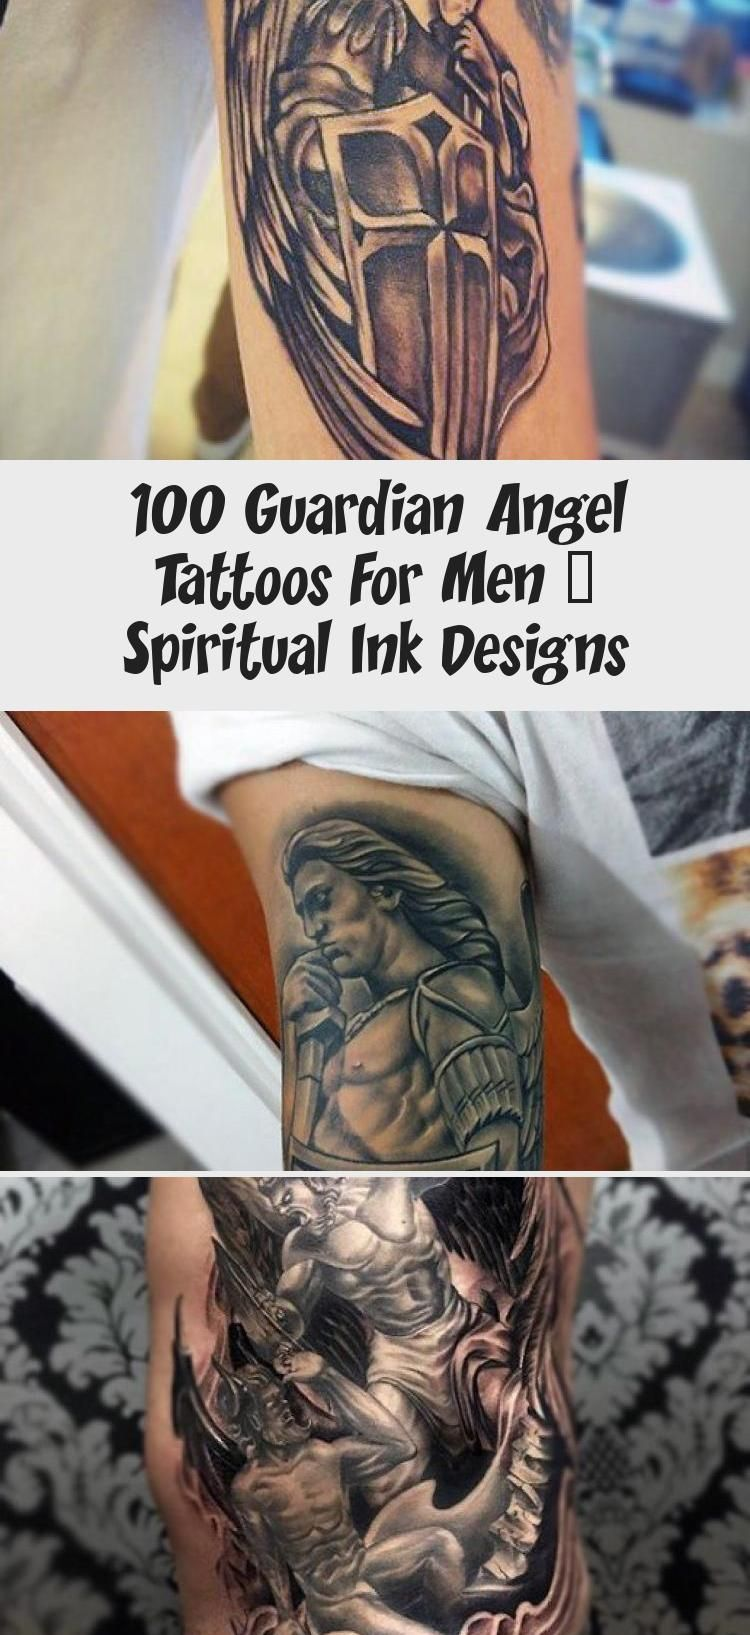 100 Guardian Angel Tattoos For Men – Spiritual Ink Designs ...